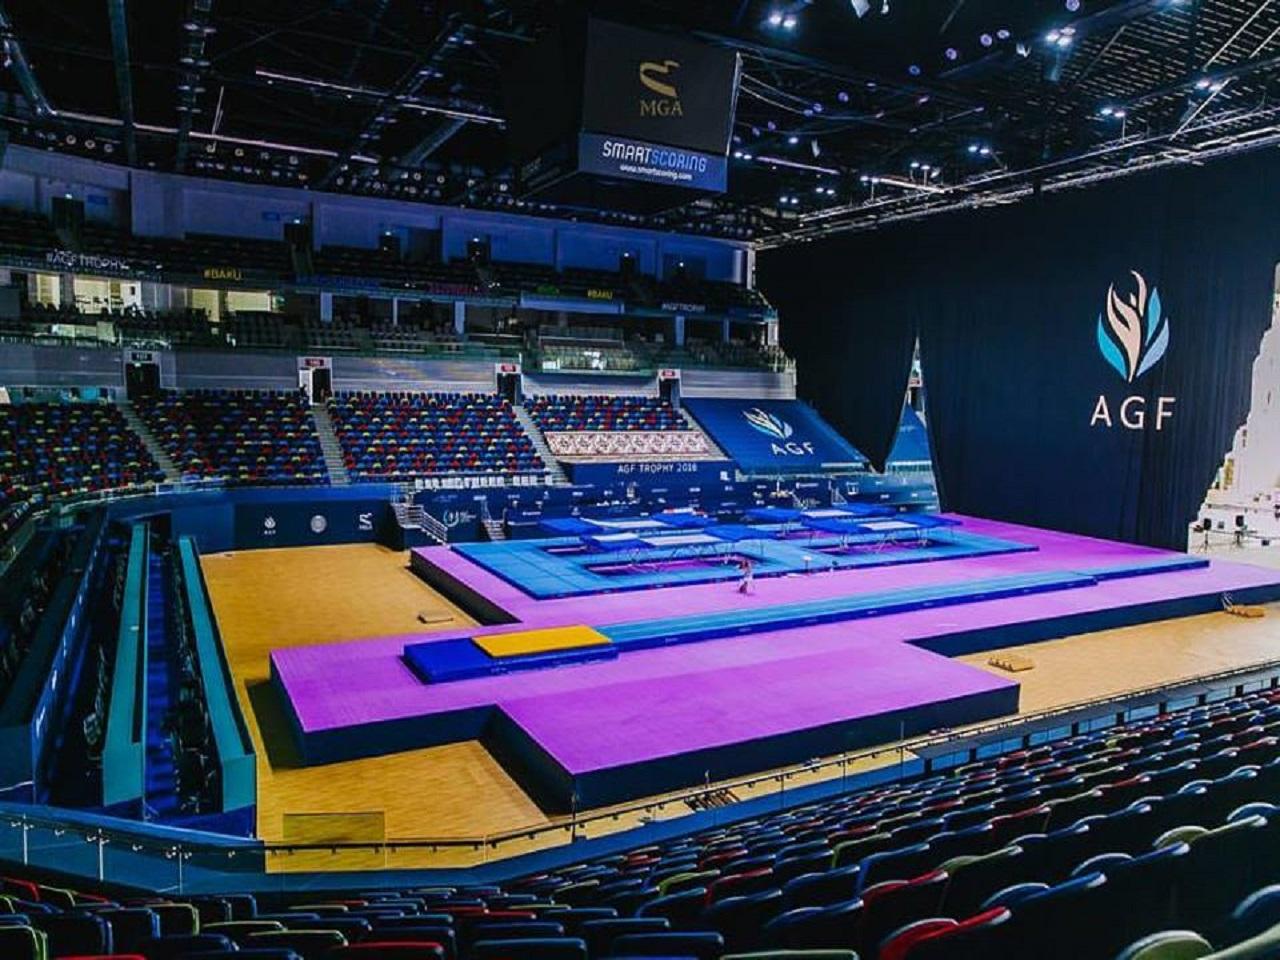 Azerbaycan Jimnastik Federasyonu